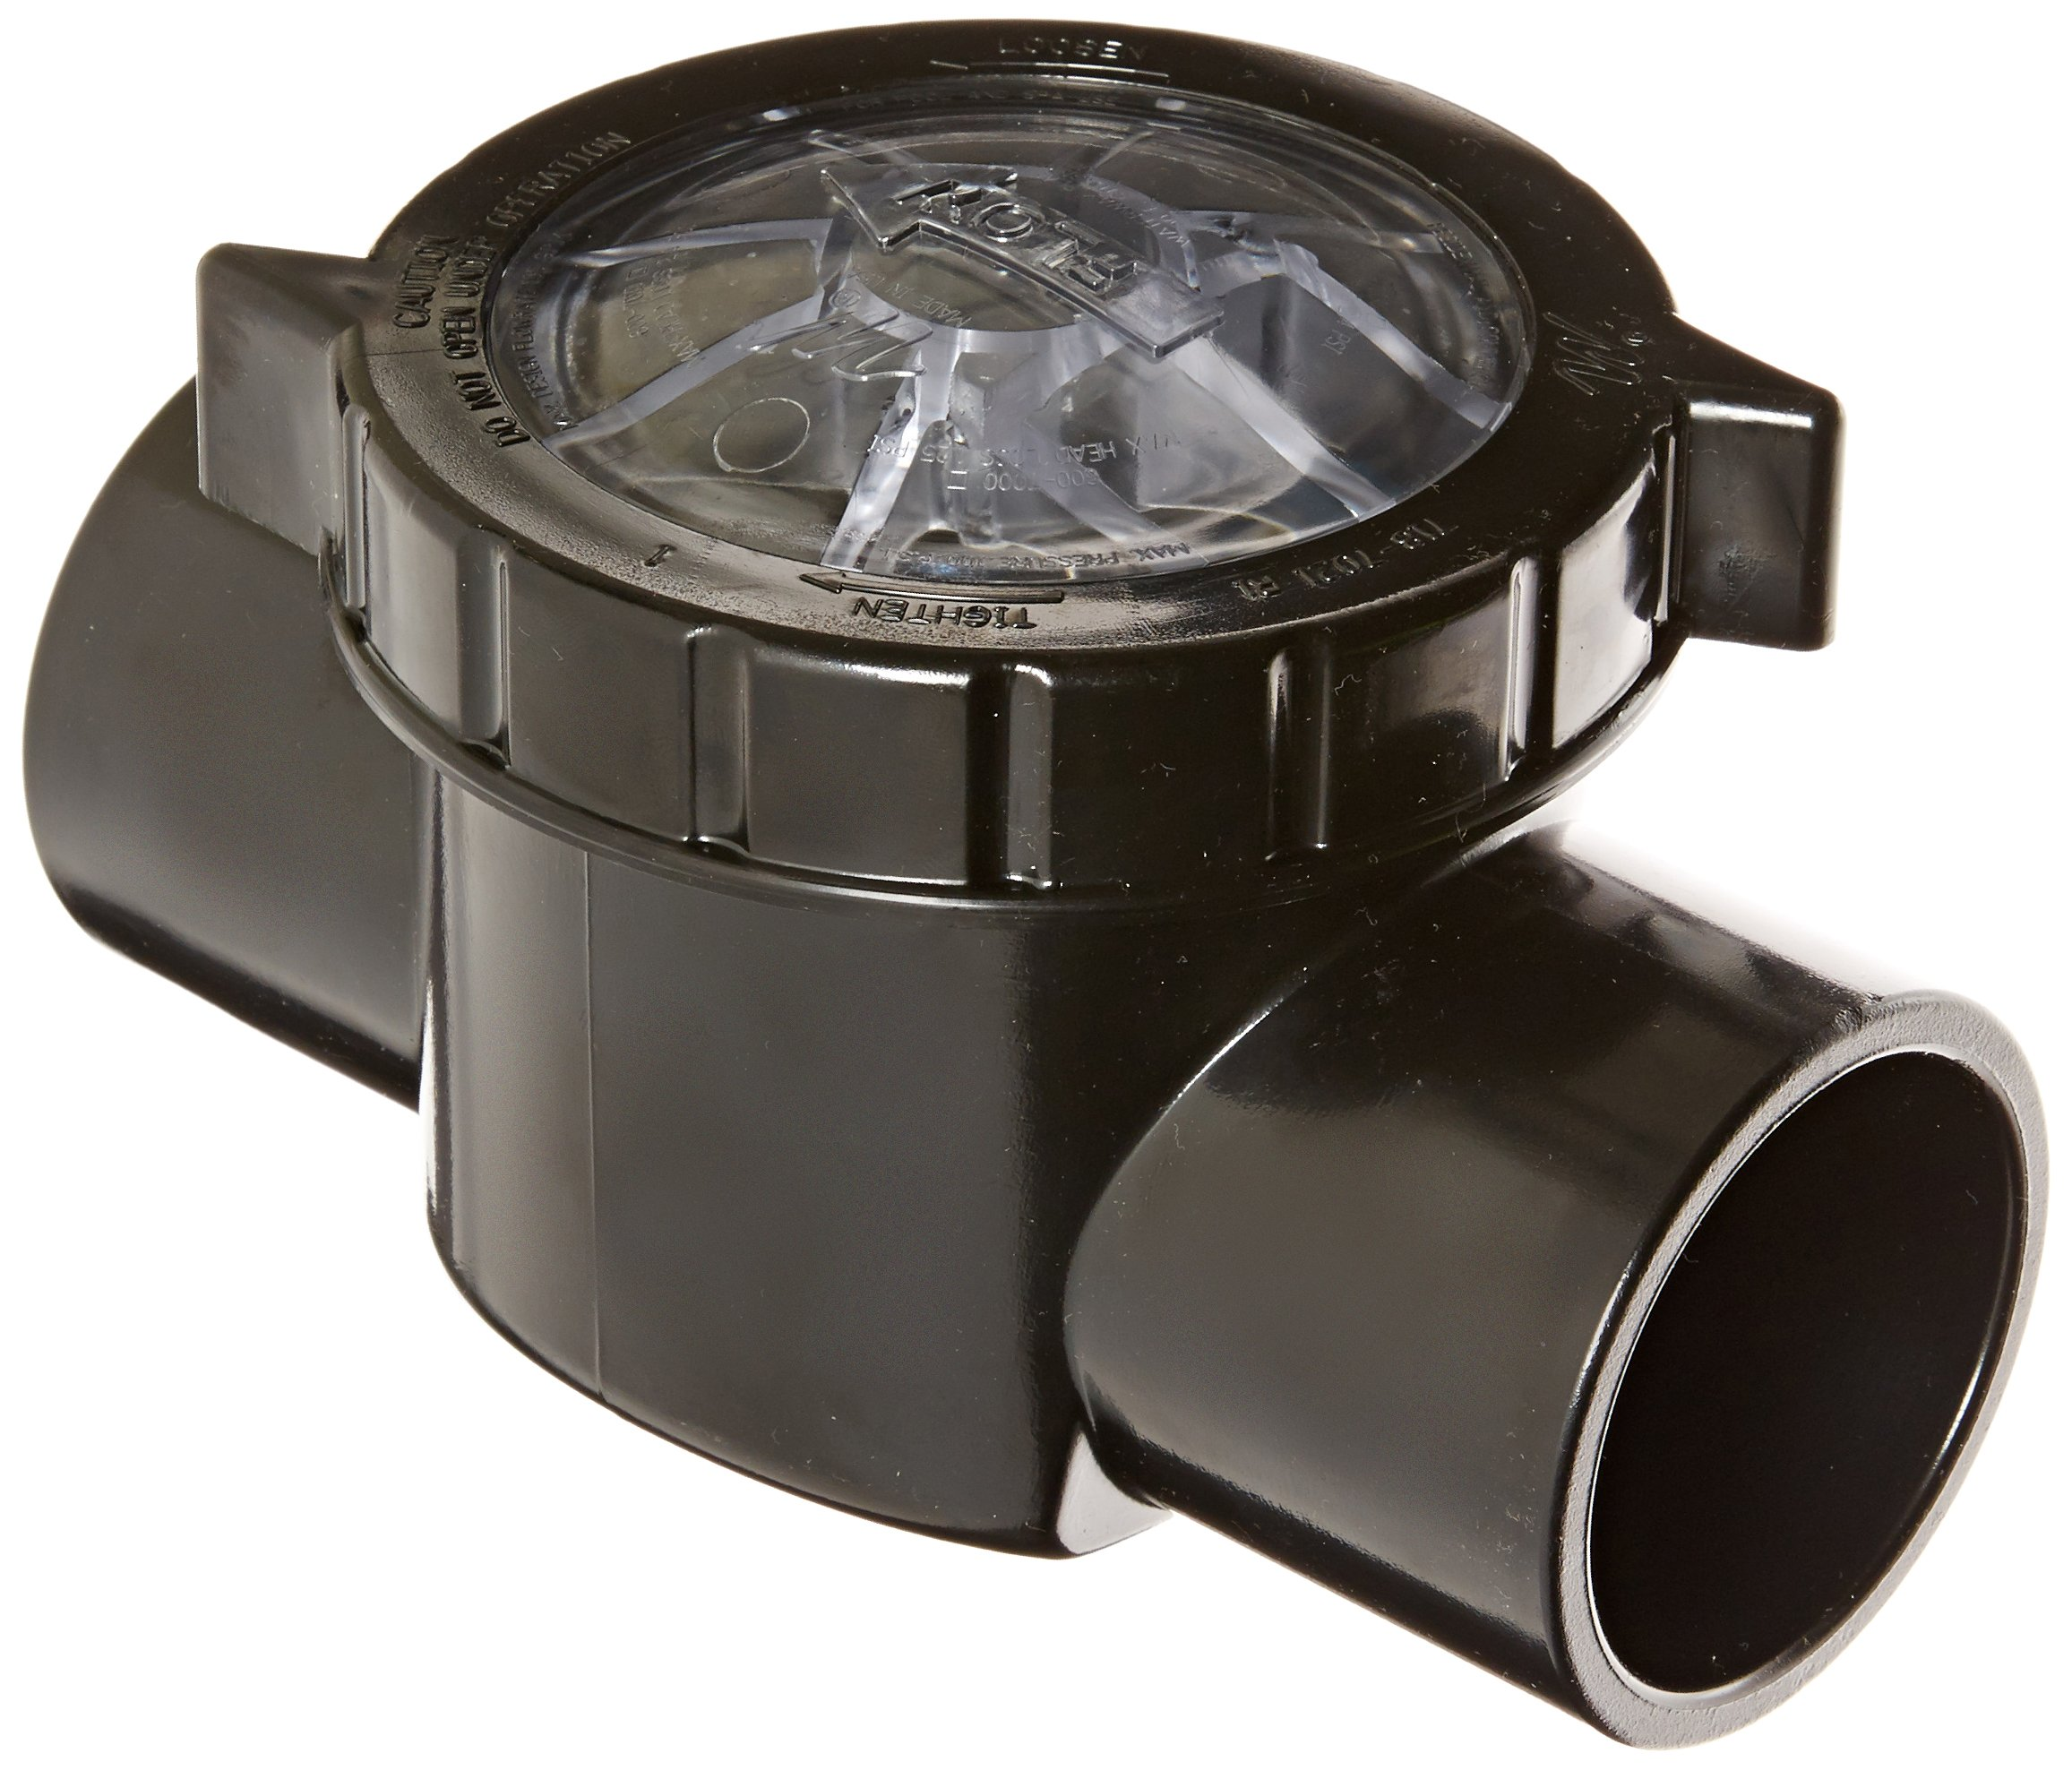 Waterway Plastics 600-7010 TruSeal Serviceable Swing Check Valve by Waterway Plastics